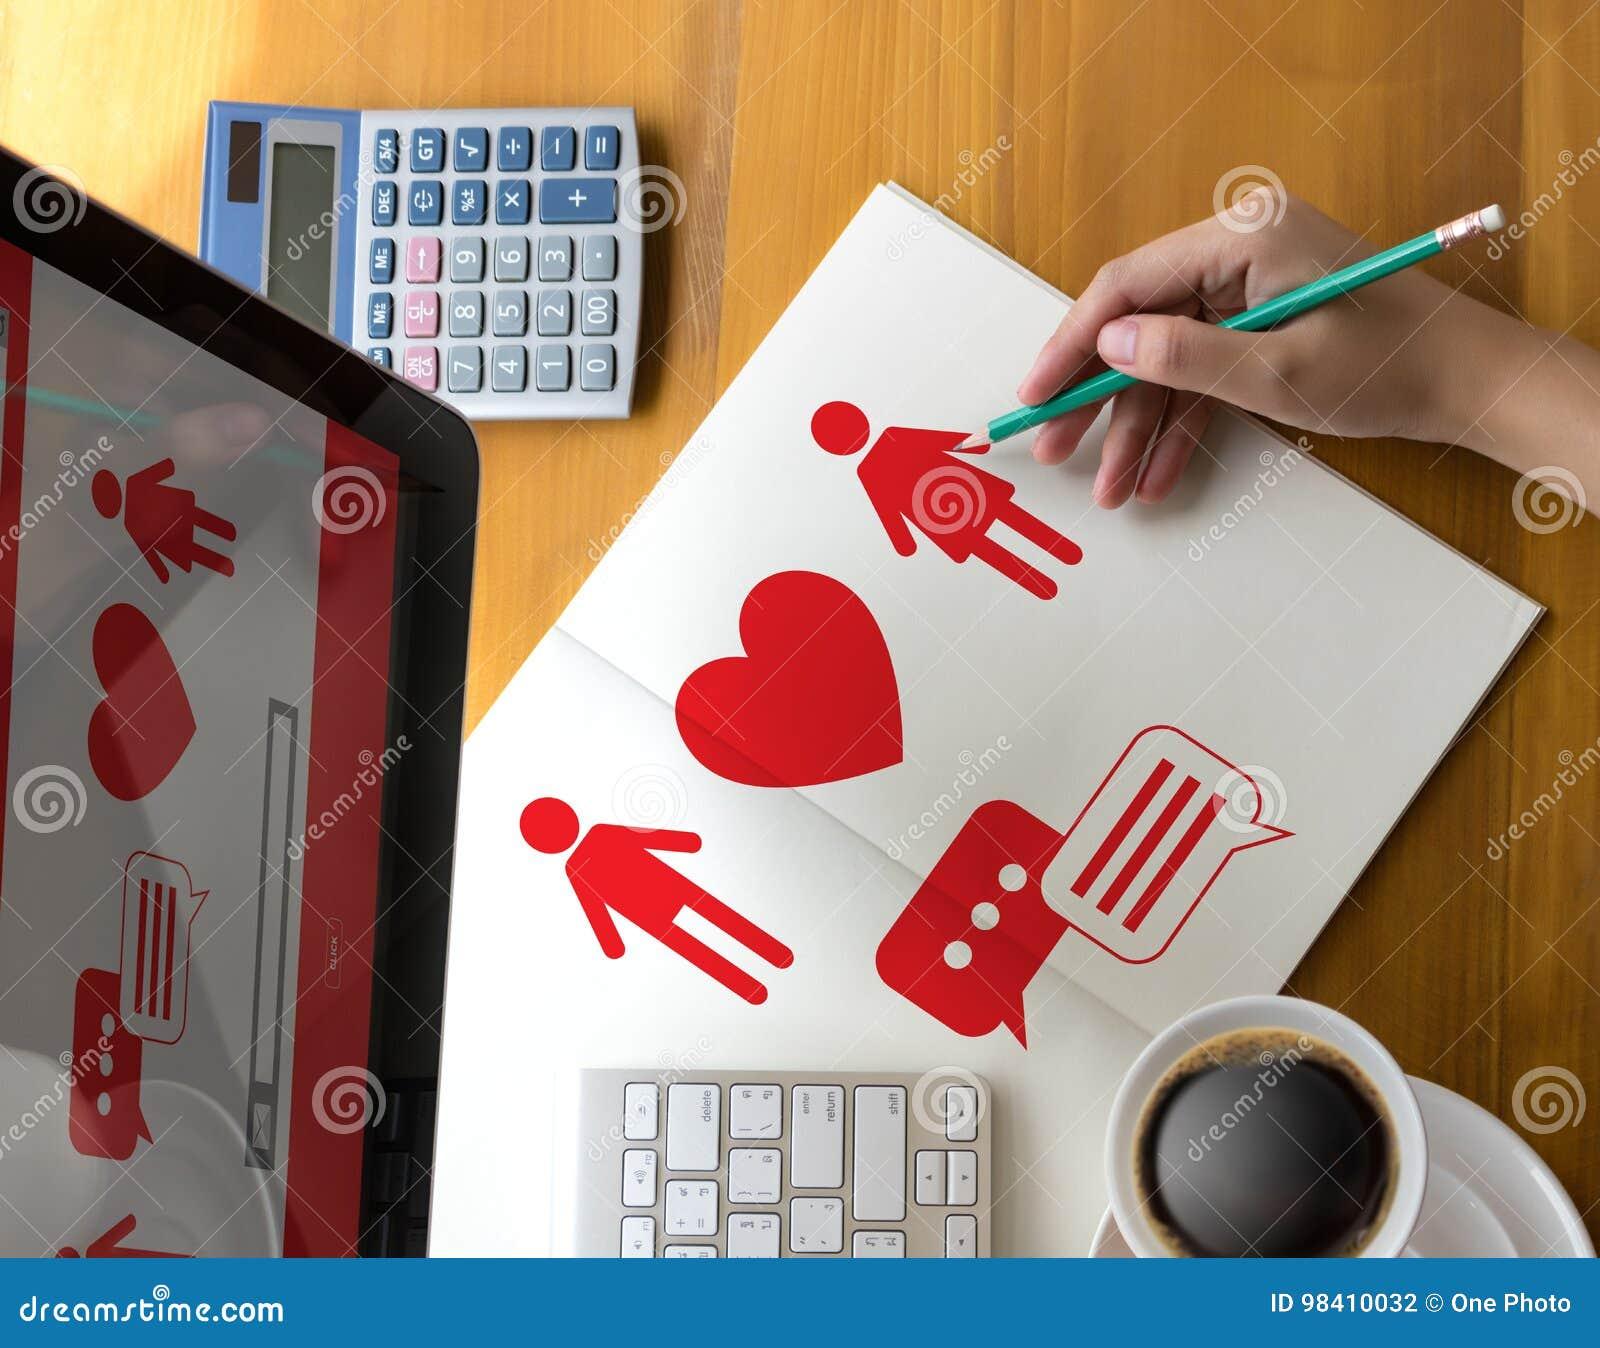 Heart online dating